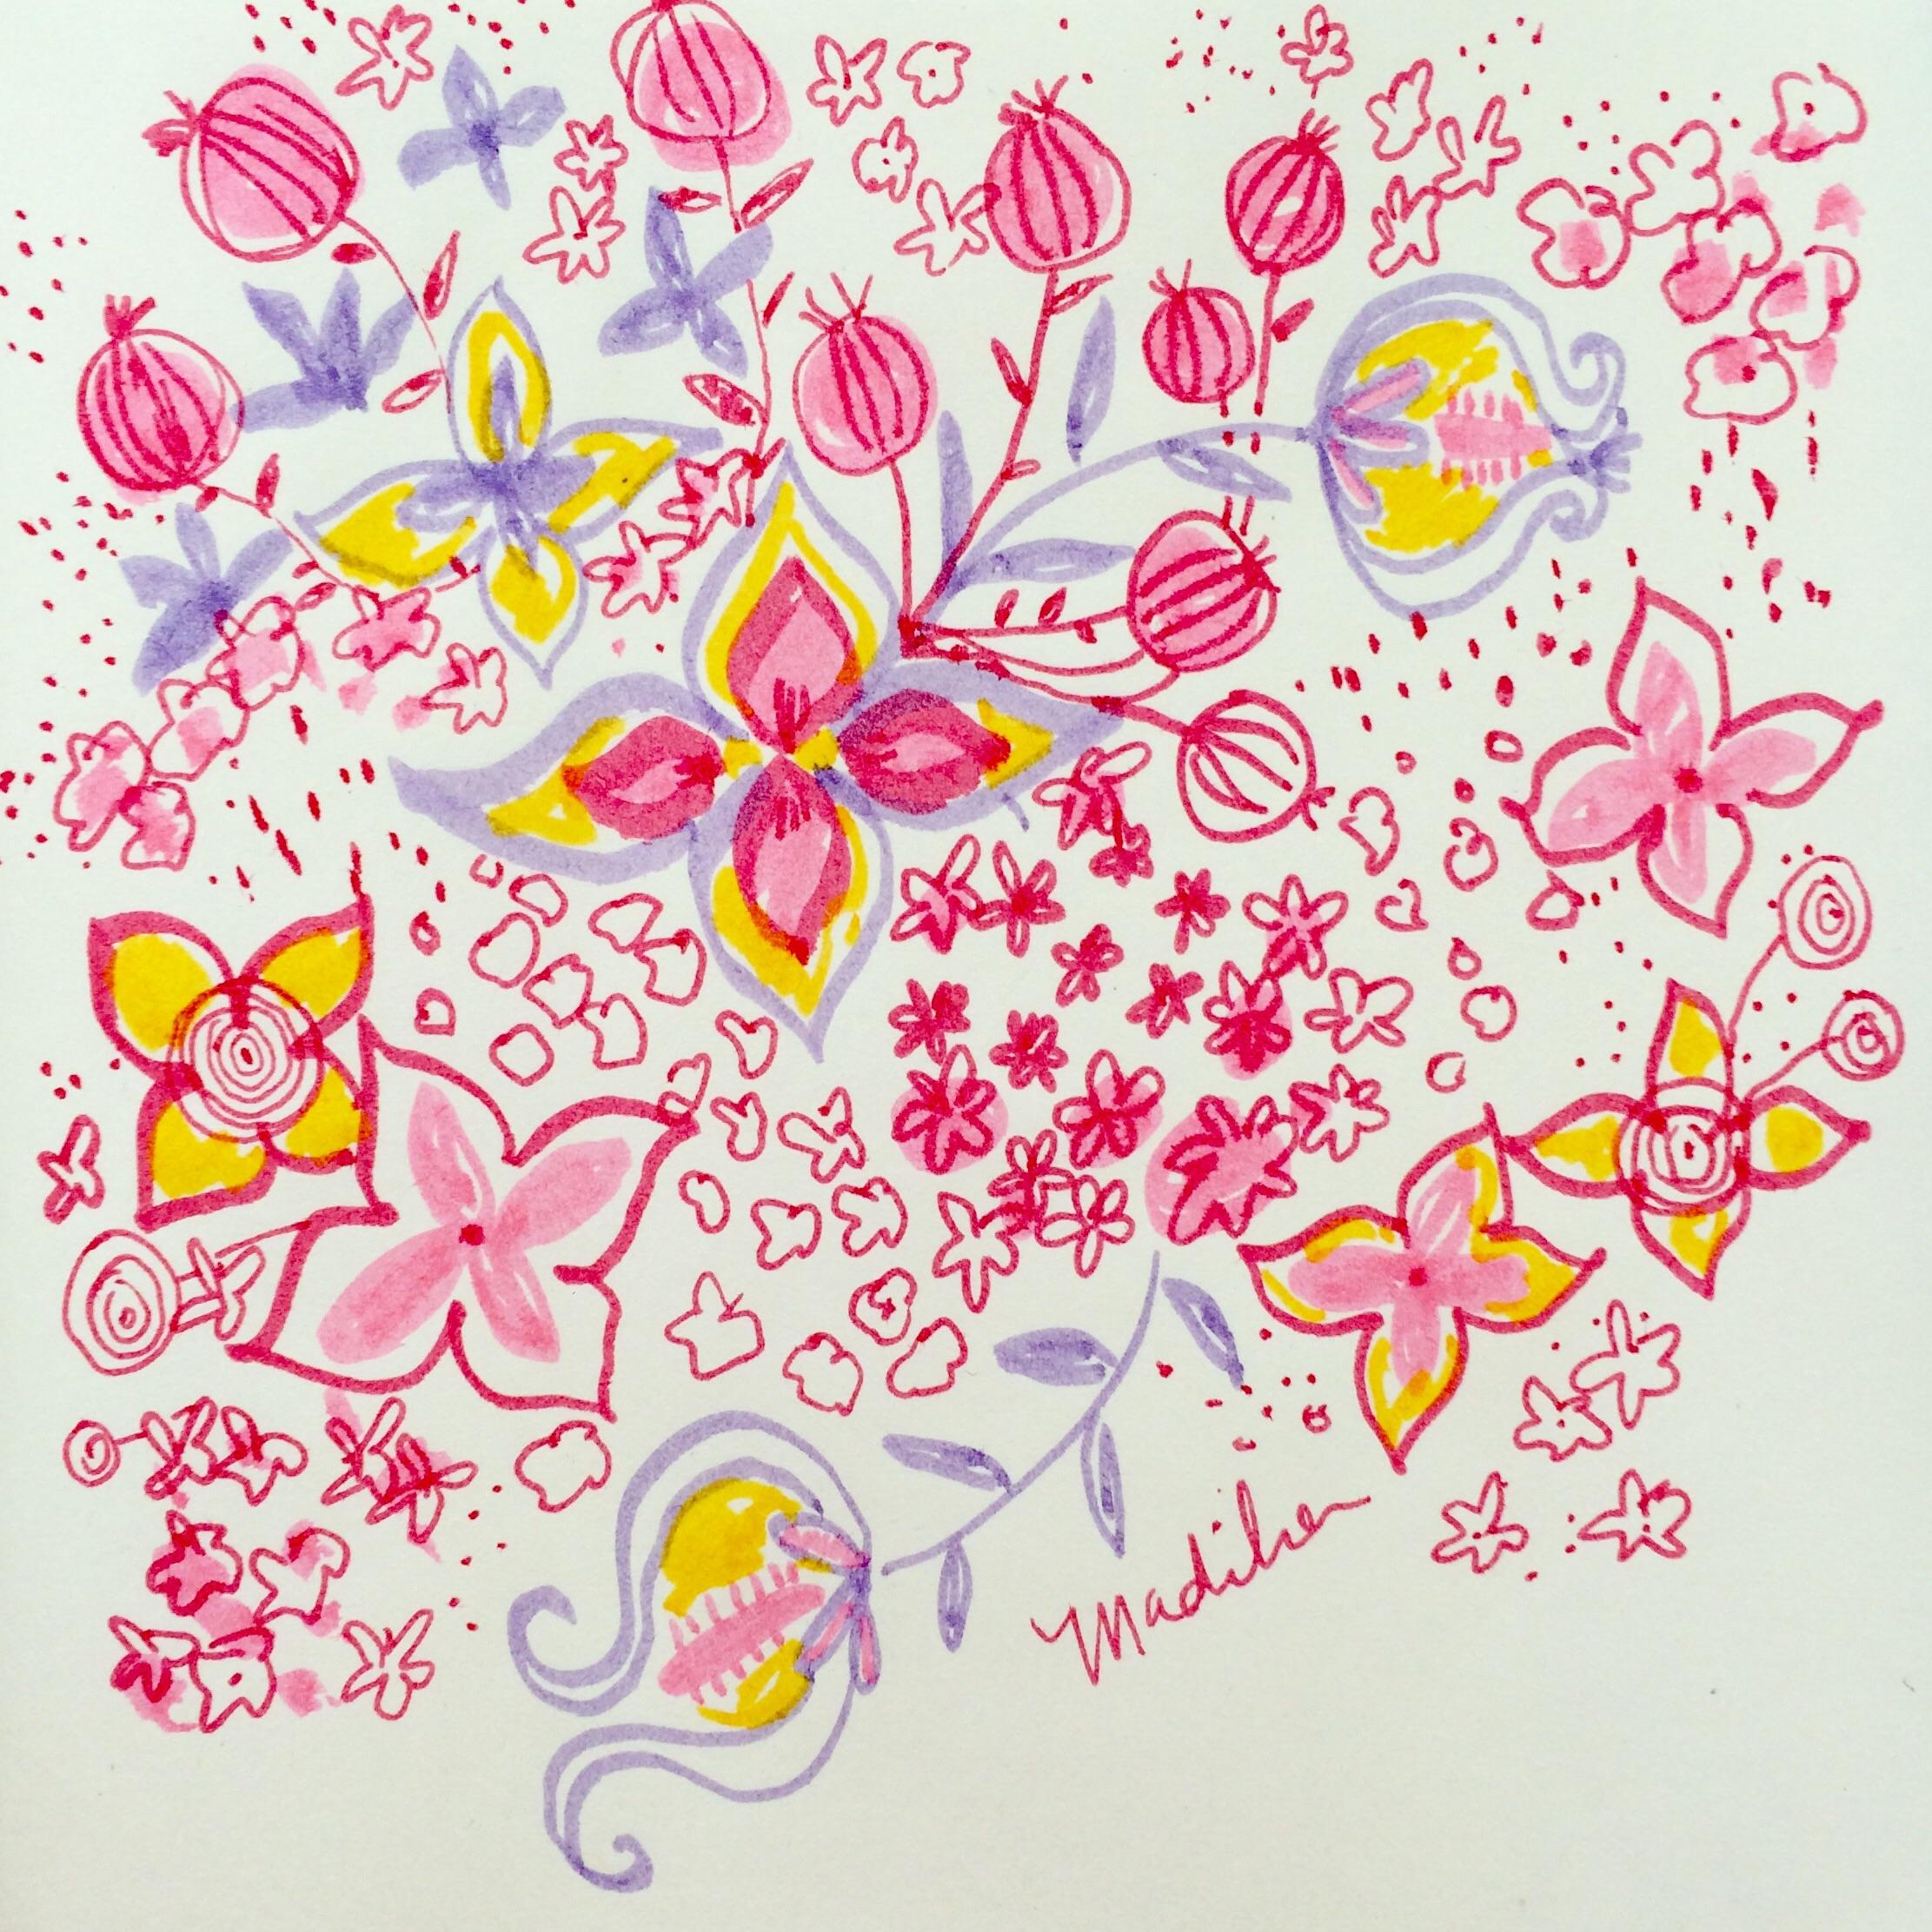 Day 27/100 floral doodle